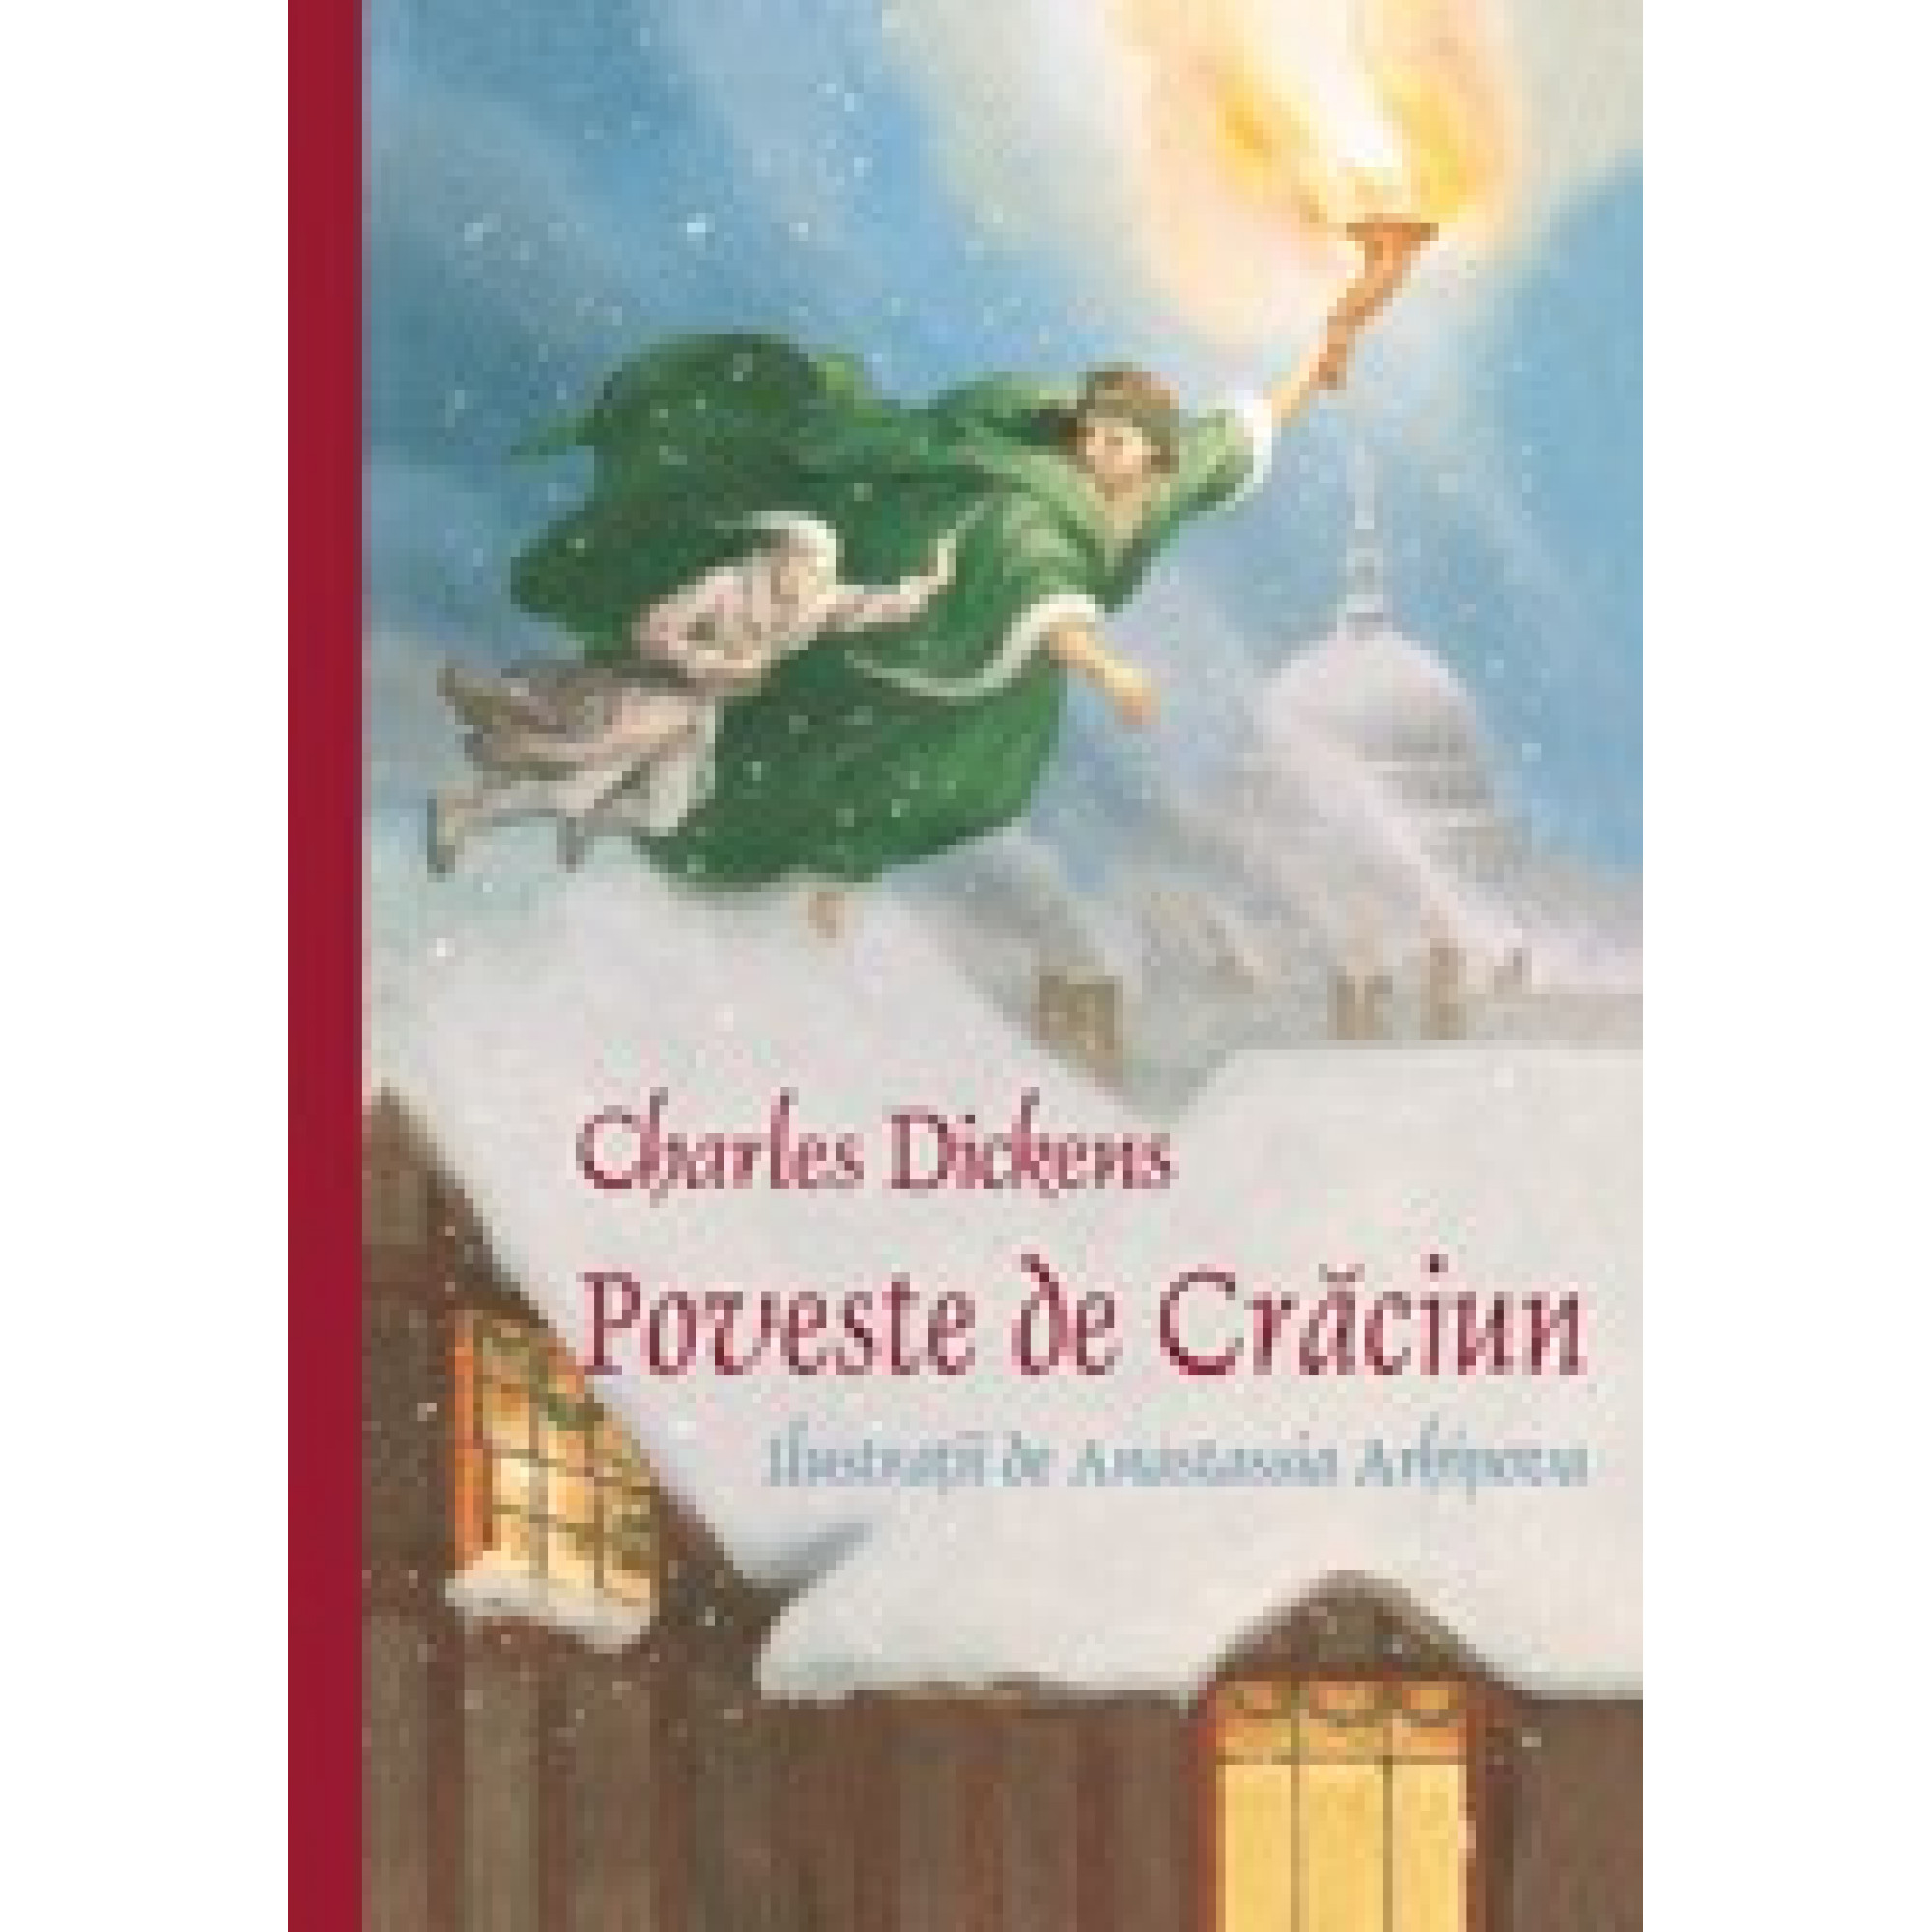 Poveste de Crăciun; Charles Dickens